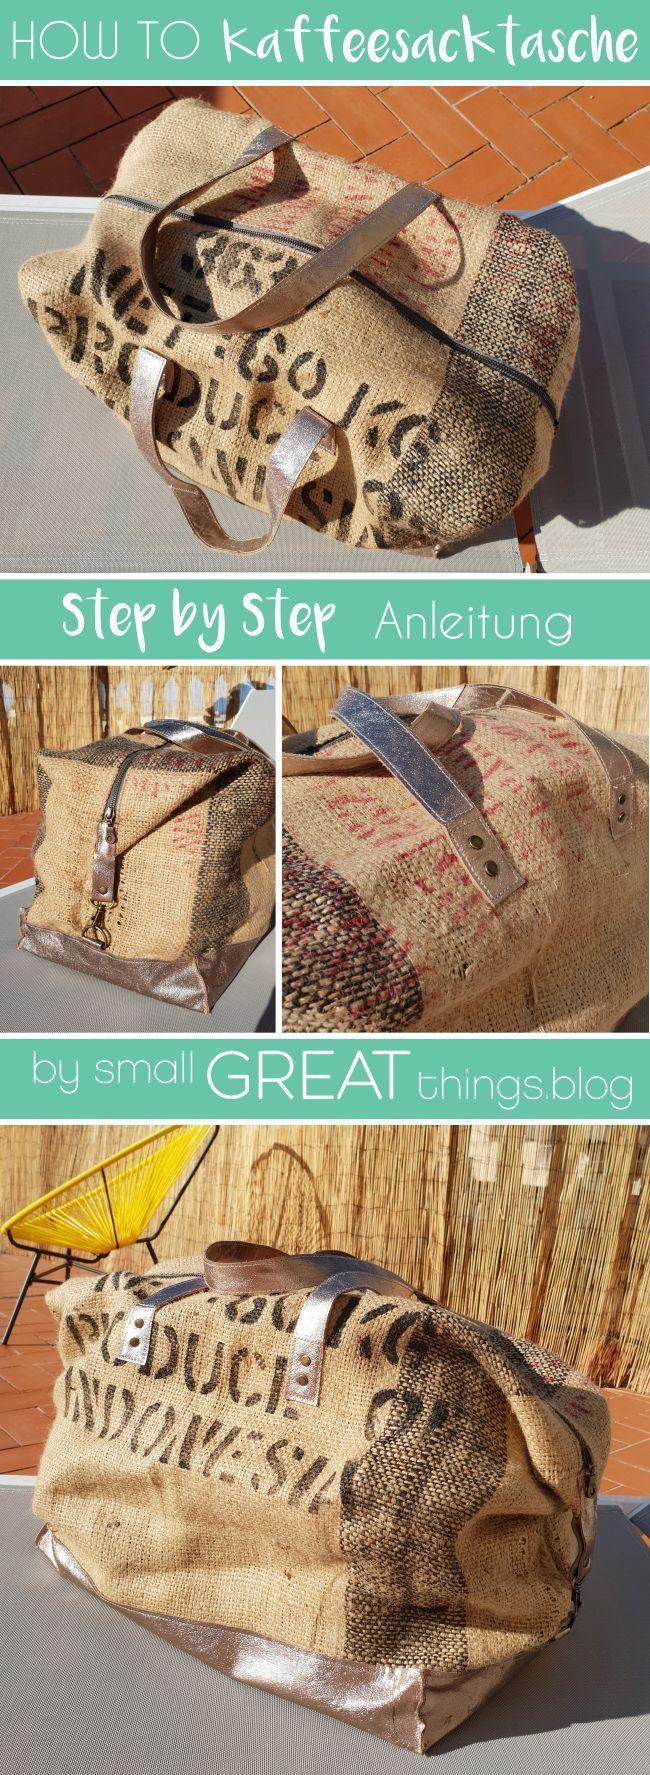 DIY Kaffeebeutel geht Duffle Bag  by small GREAT things